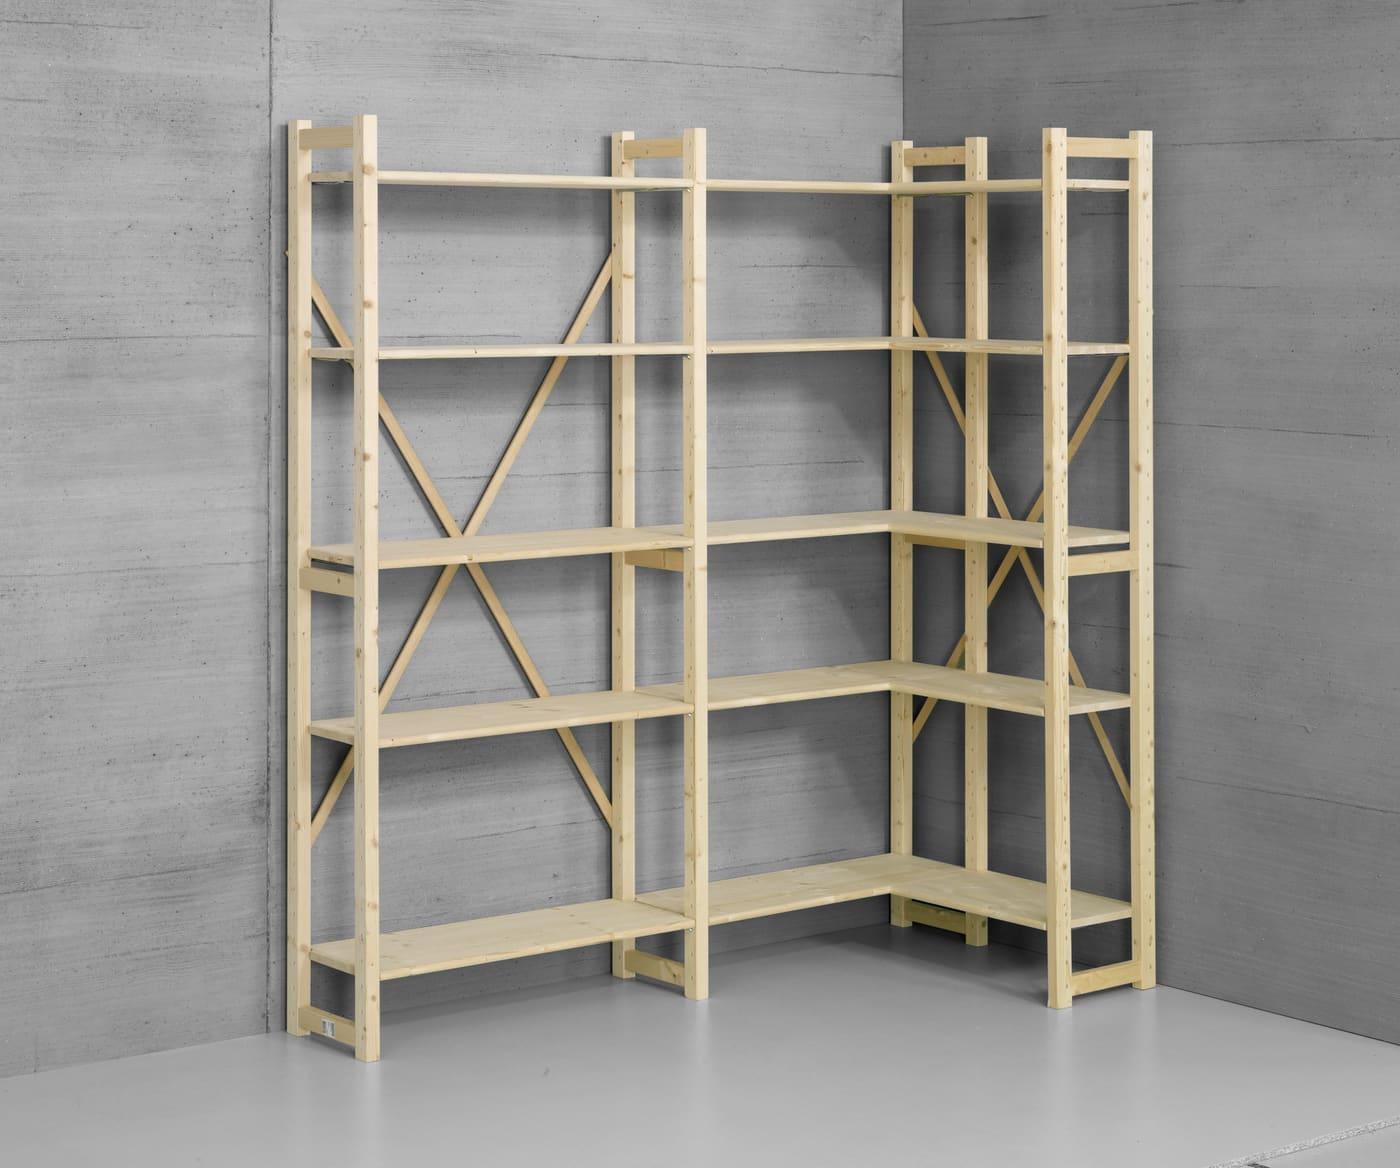 wasa etag re migros. Black Bedroom Furniture Sets. Home Design Ideas